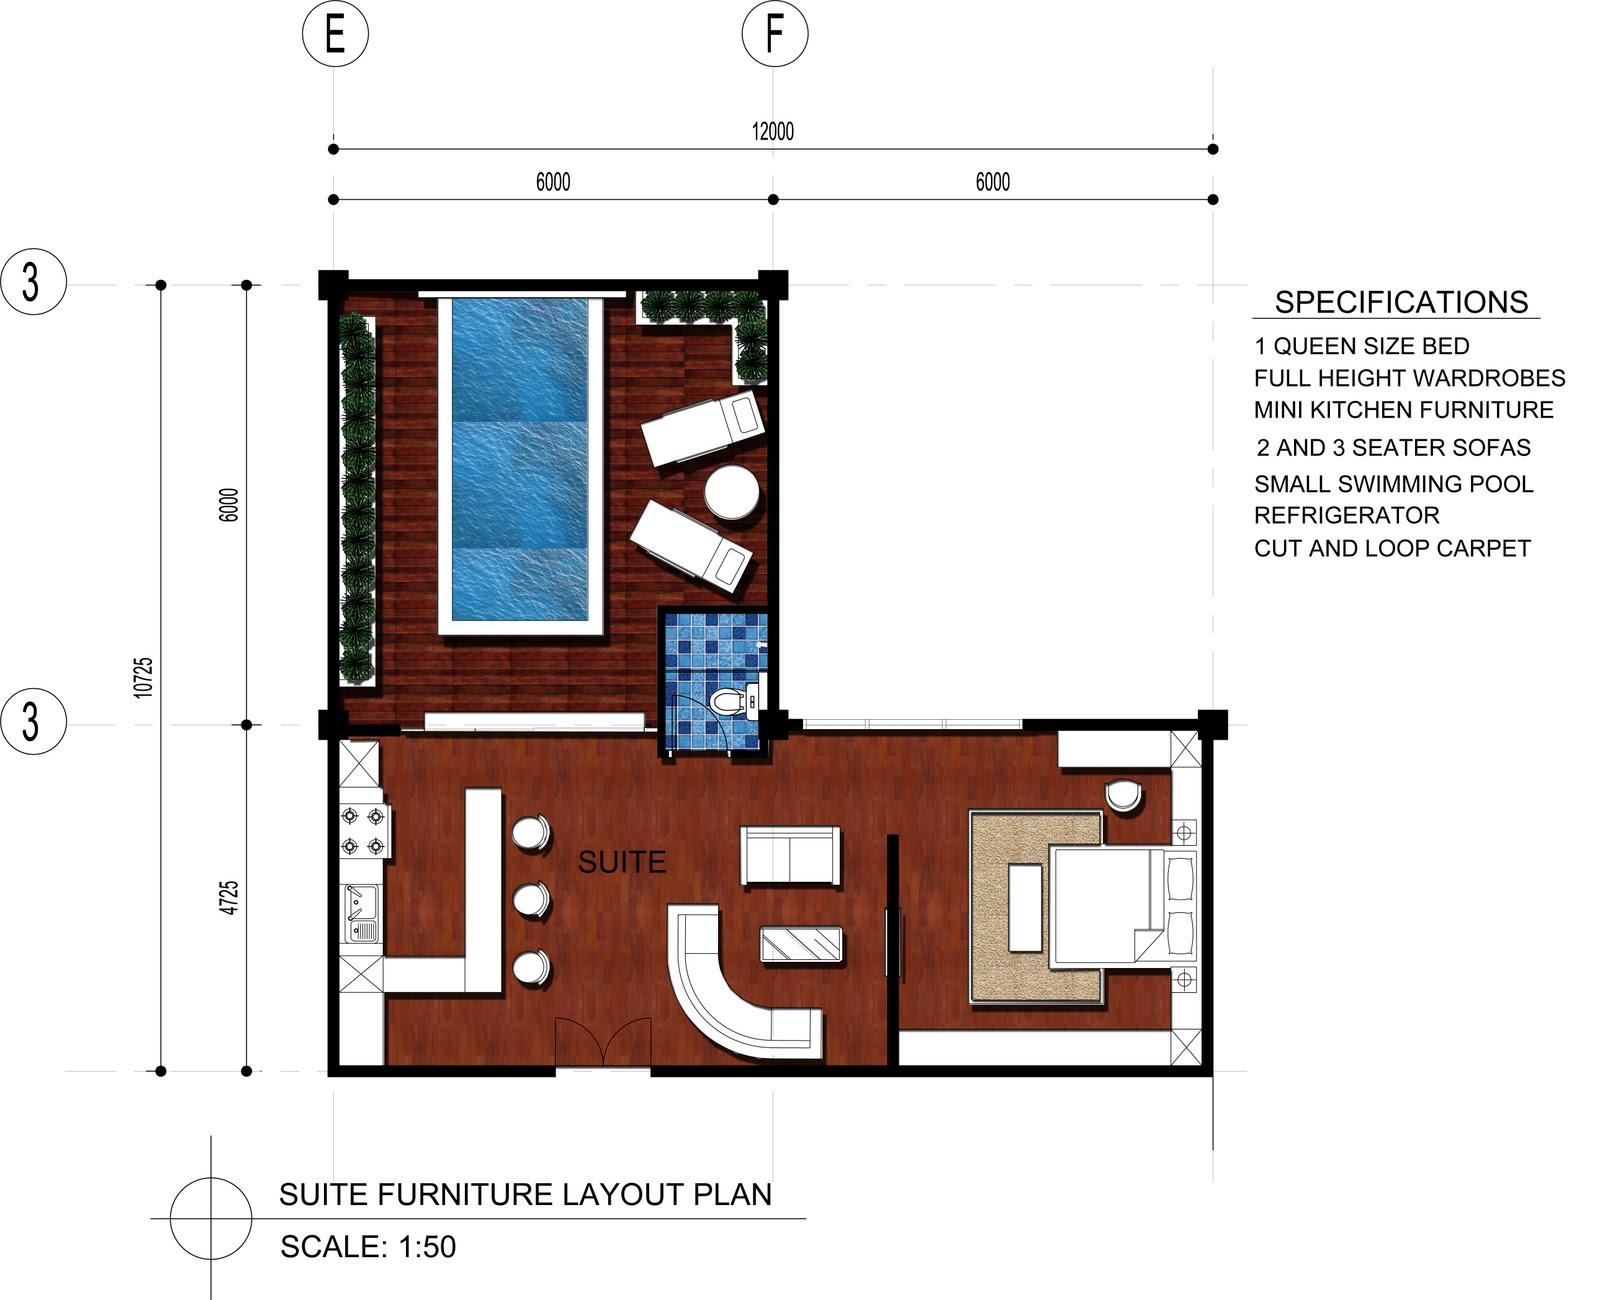 Drawn bedroom 3d classroom Banquet 3d Game Designing Software